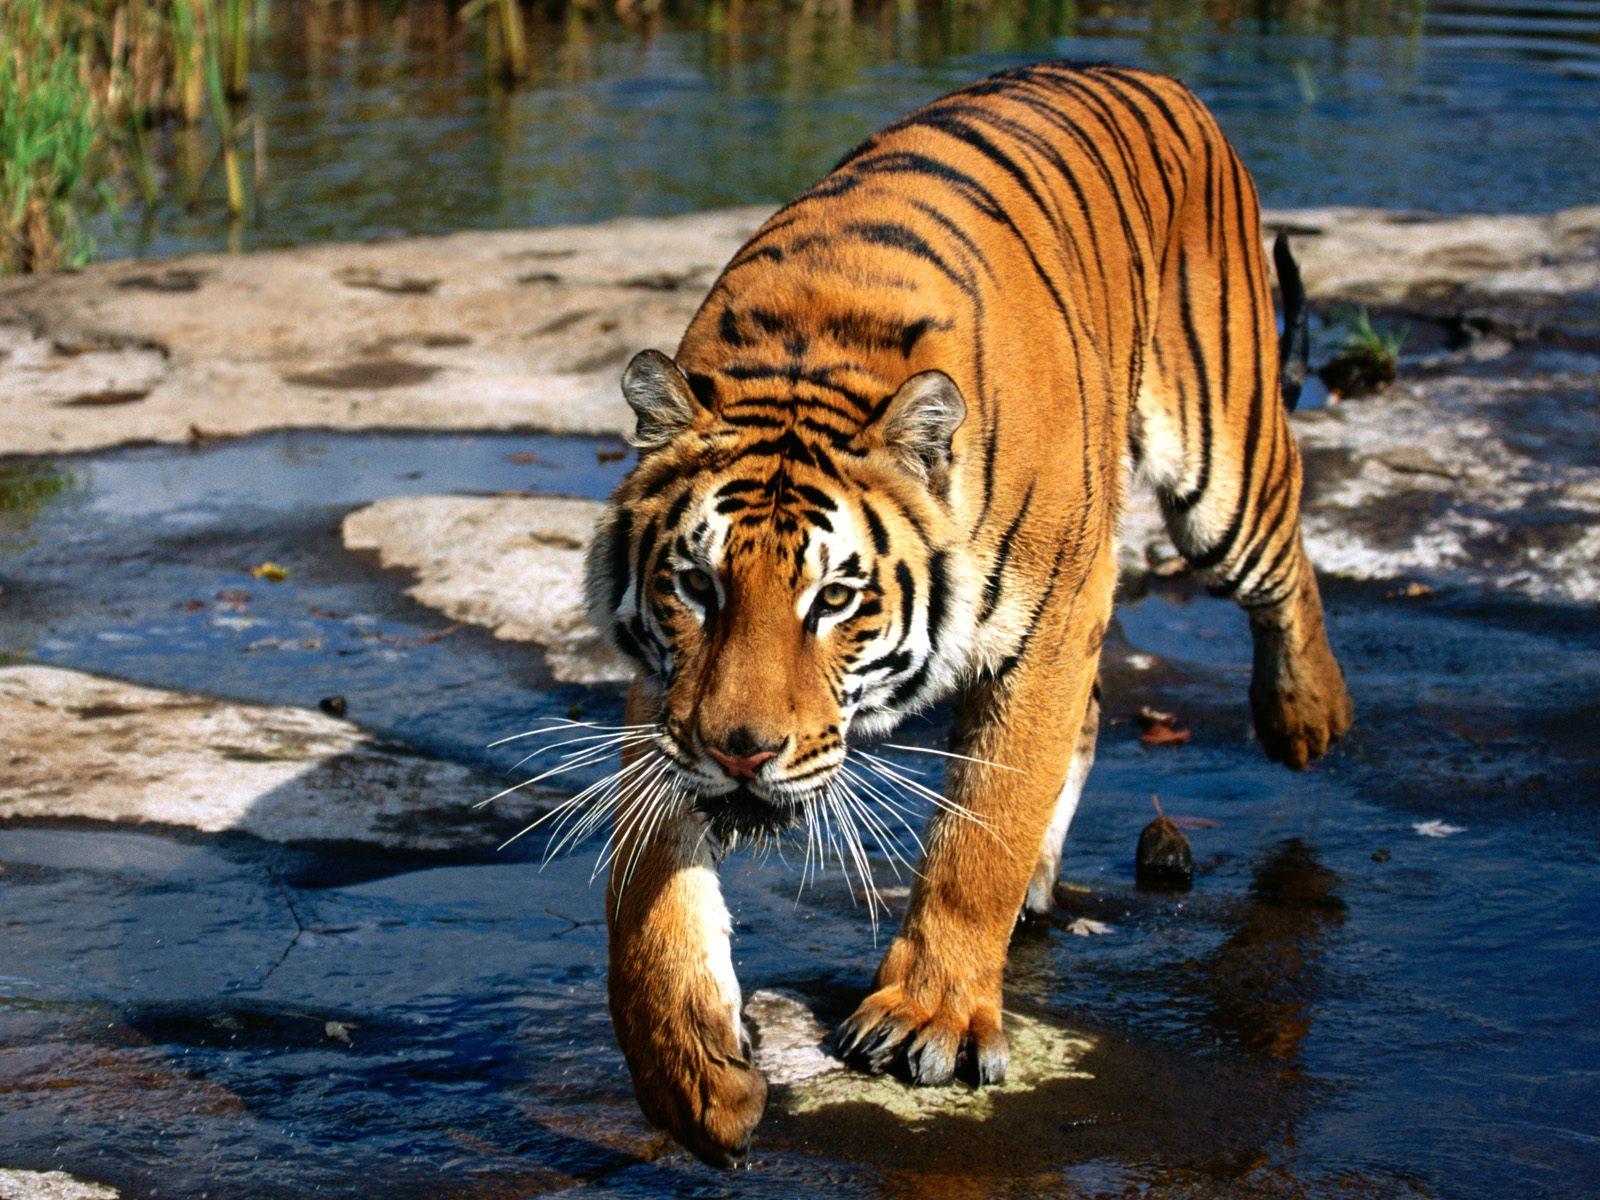 Tiger | The Biggest Animals Kingdom